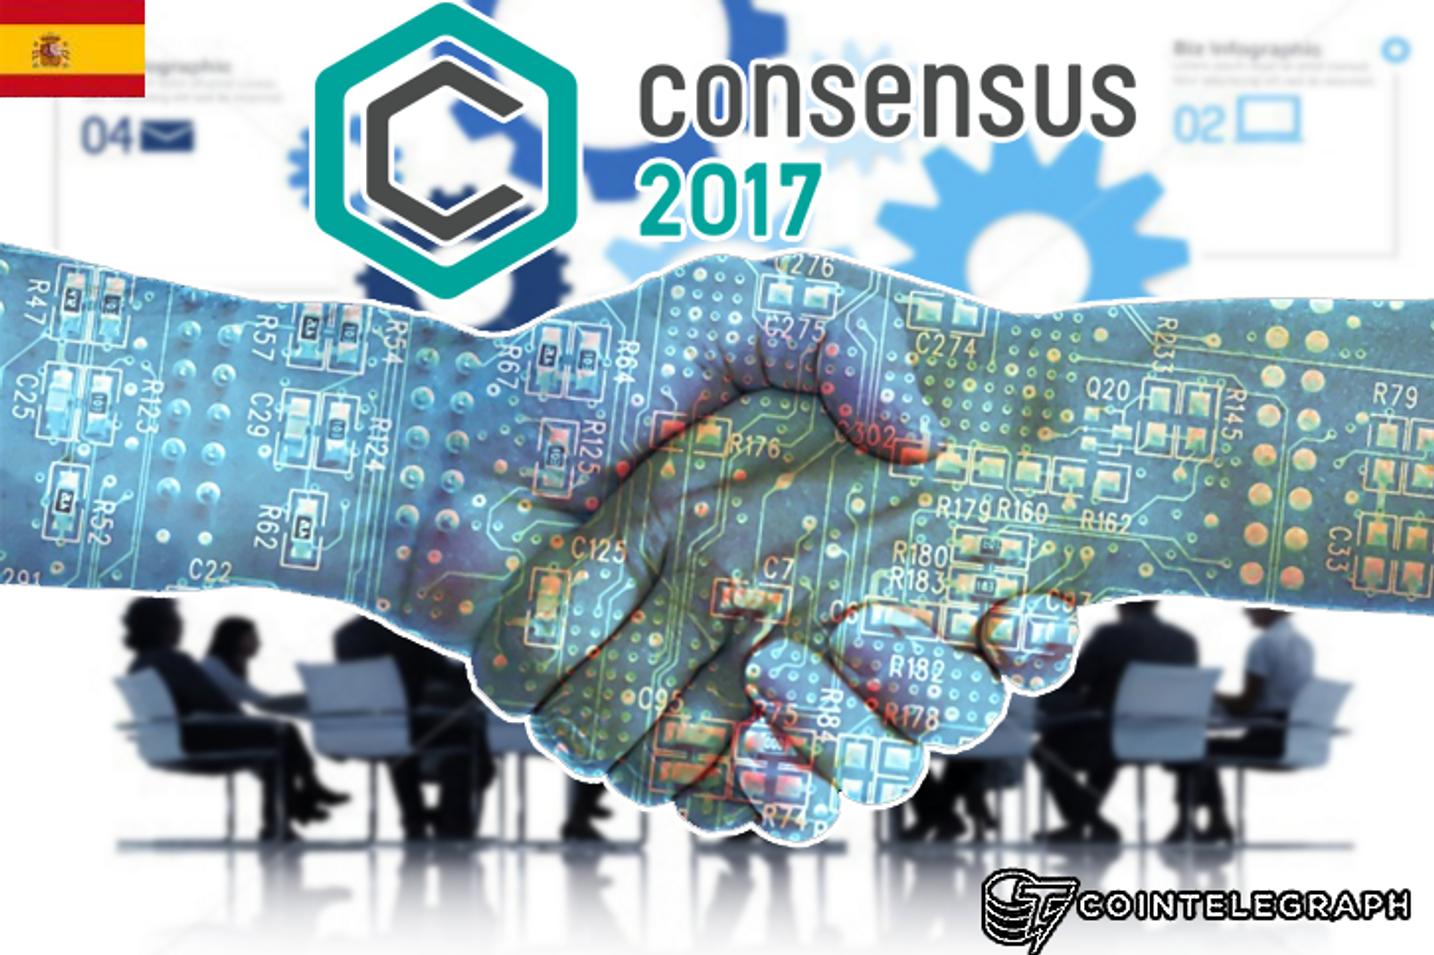 Consensus 2017 - Resumen: paneles y discusiones sobre Blockchain